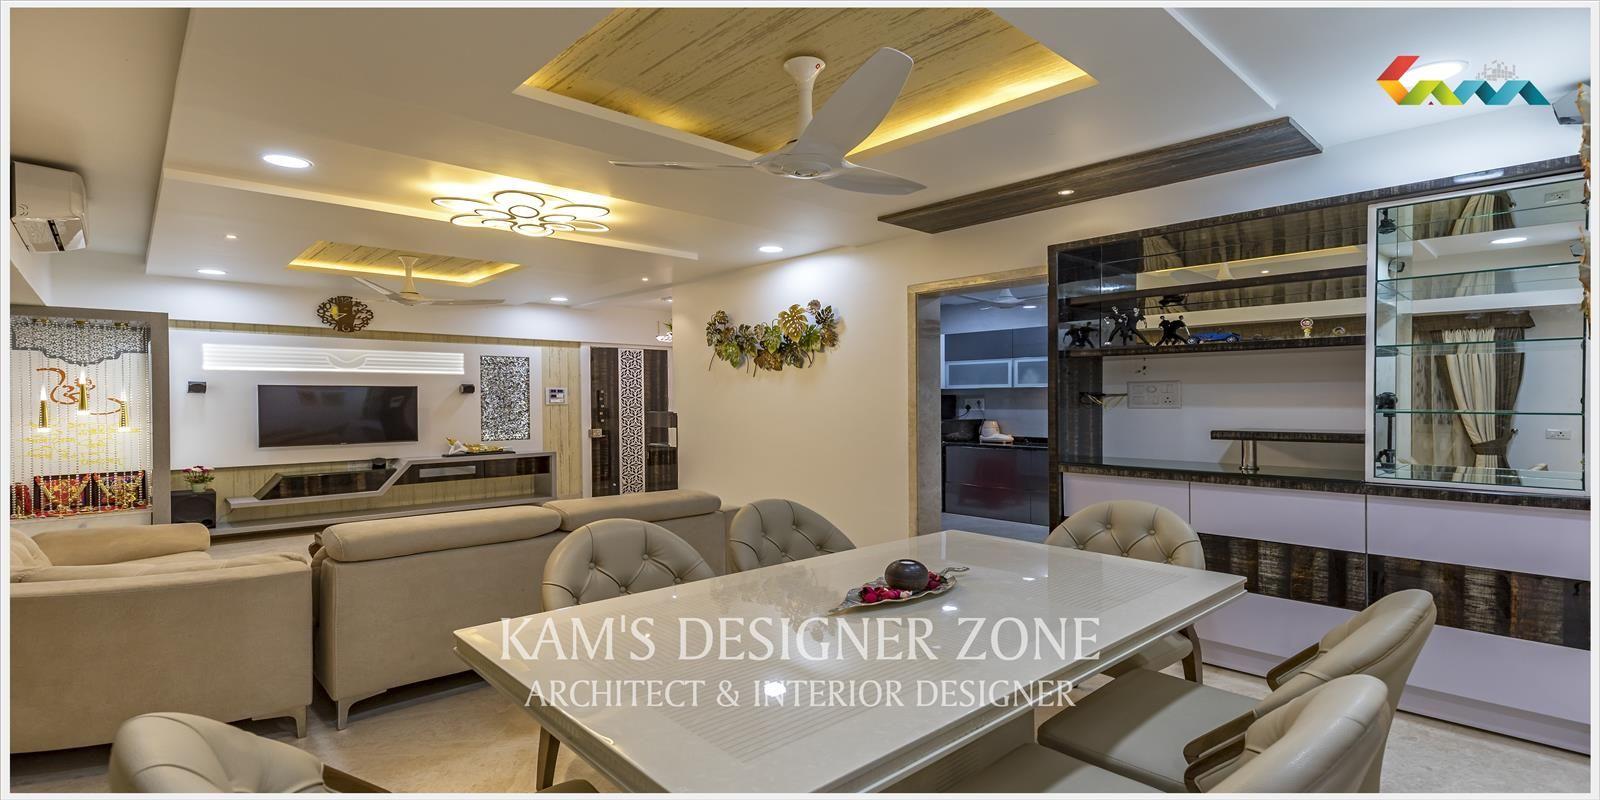 Interior Designer In Kalyani Nagar Kams Designer Zone With